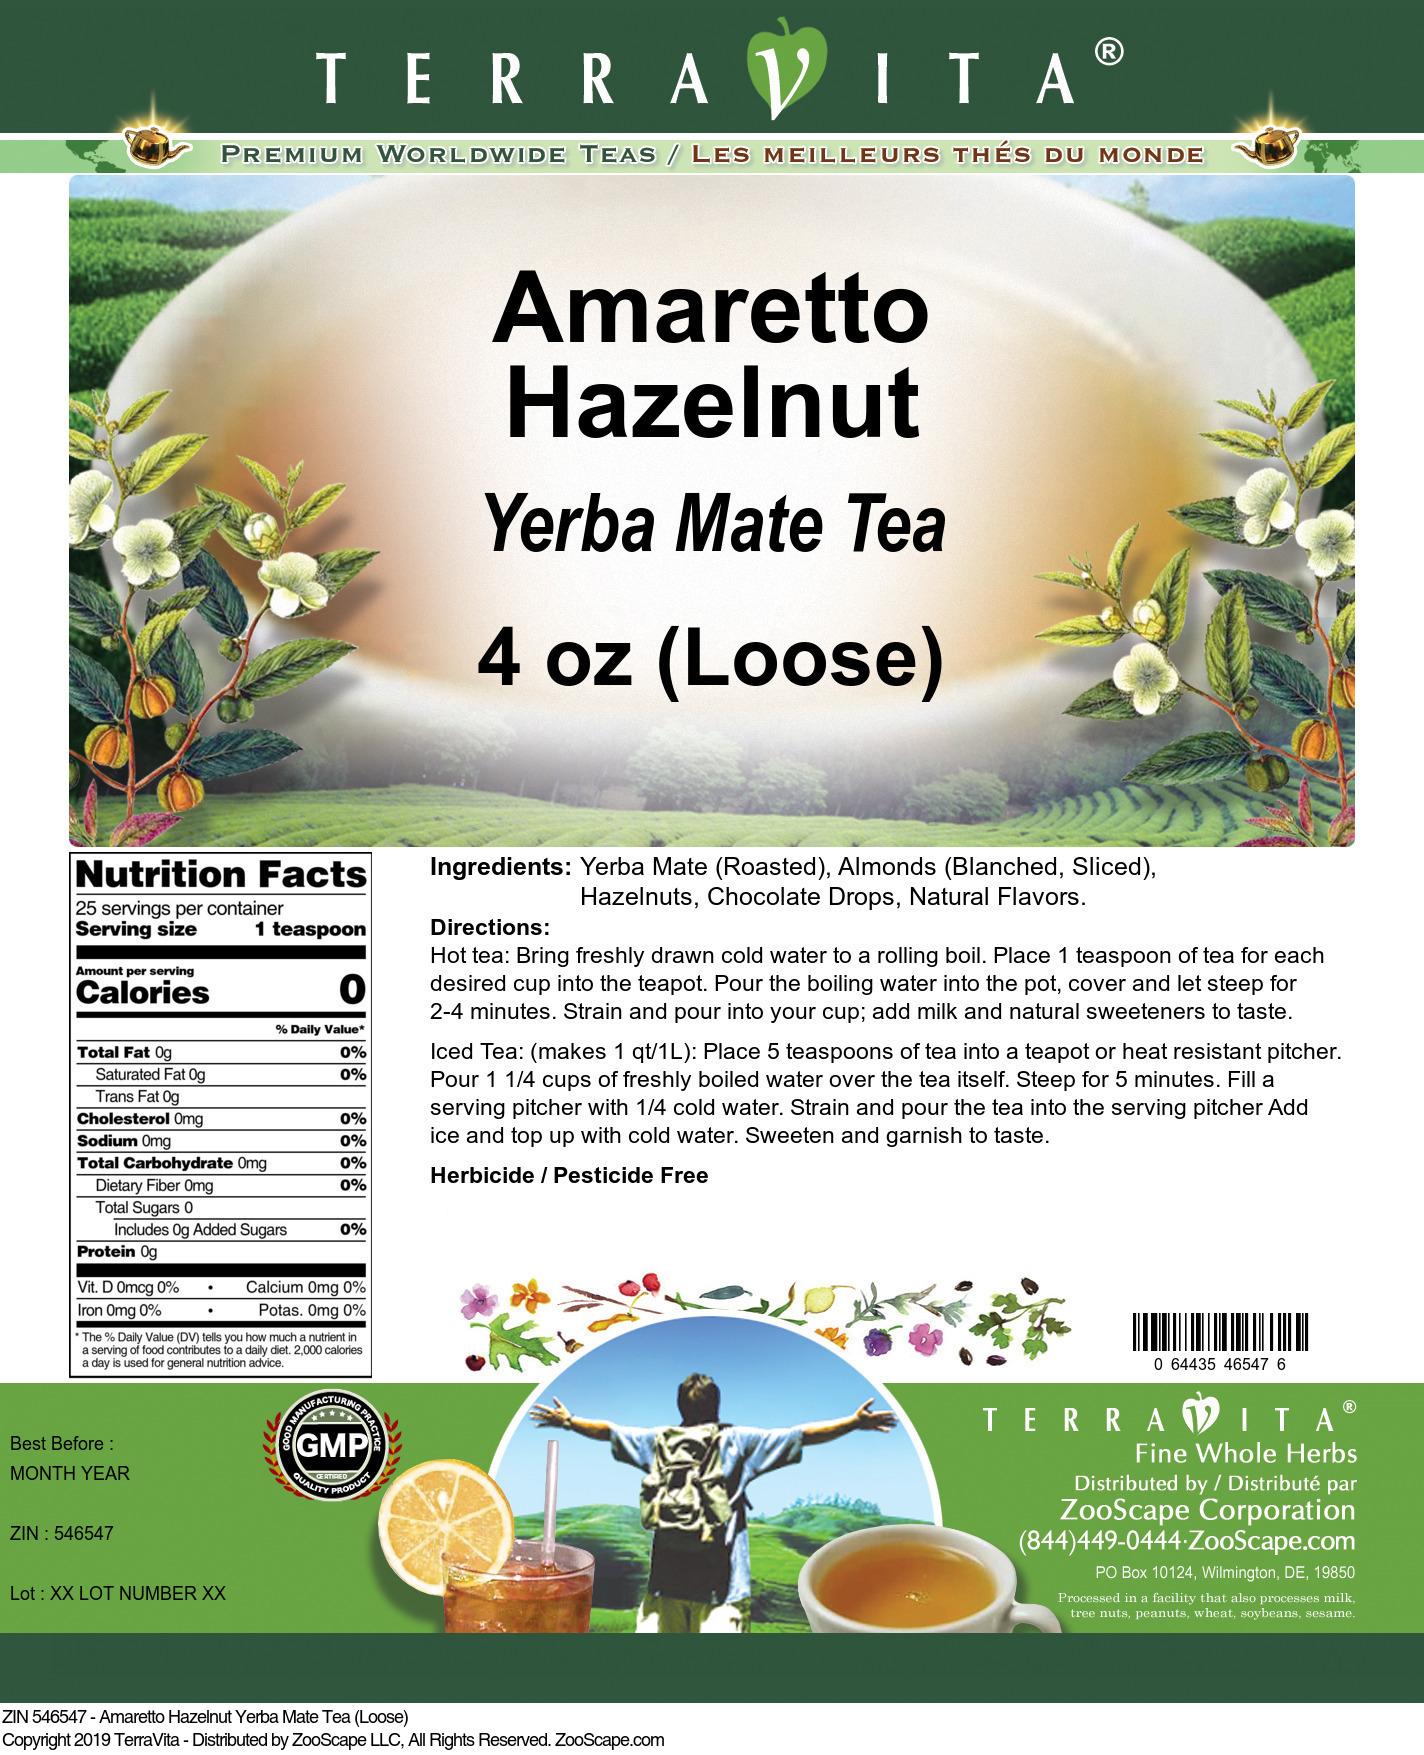 Amaretto Hazelnut Yerba Mate Tea (Loose)